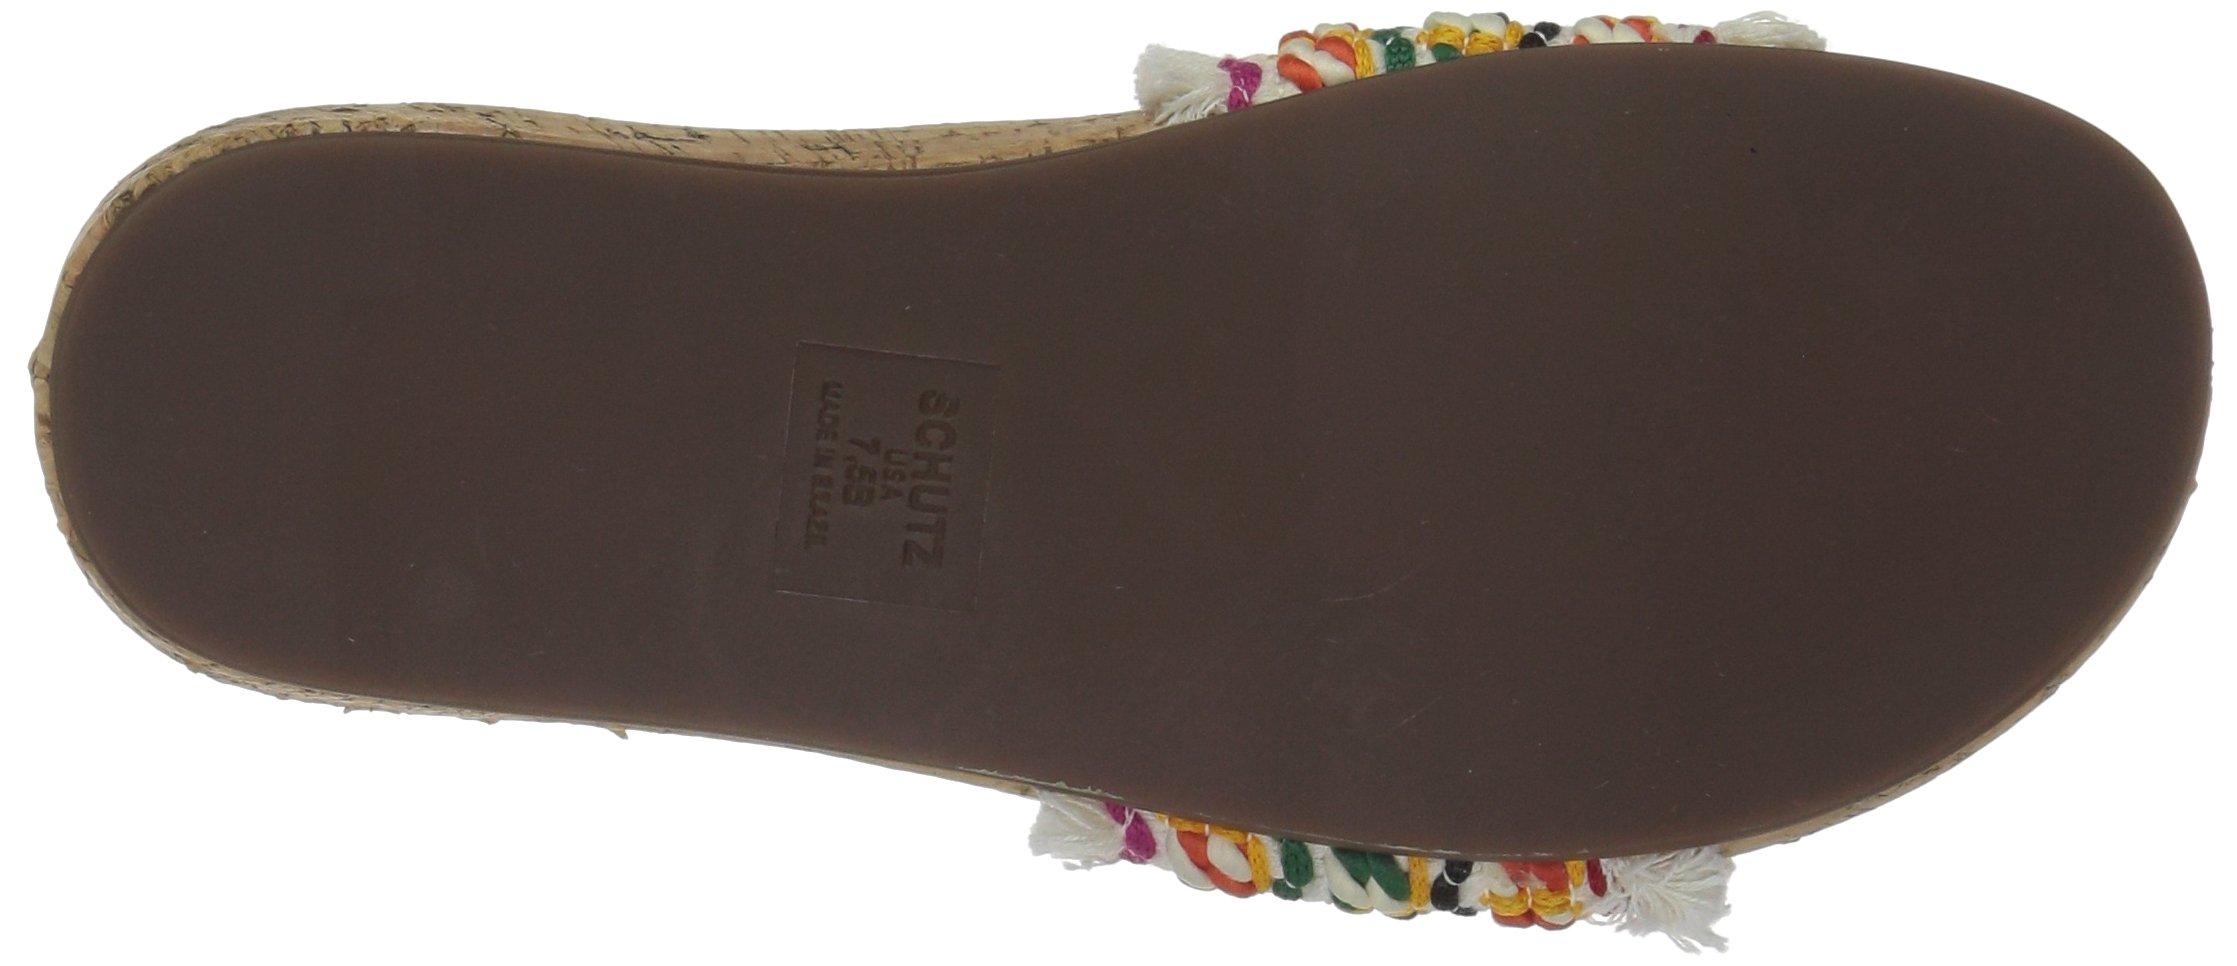 Schutz Women's KAHARA Slide Sandal, Multi, 9 M US by Schutz (Image #3)